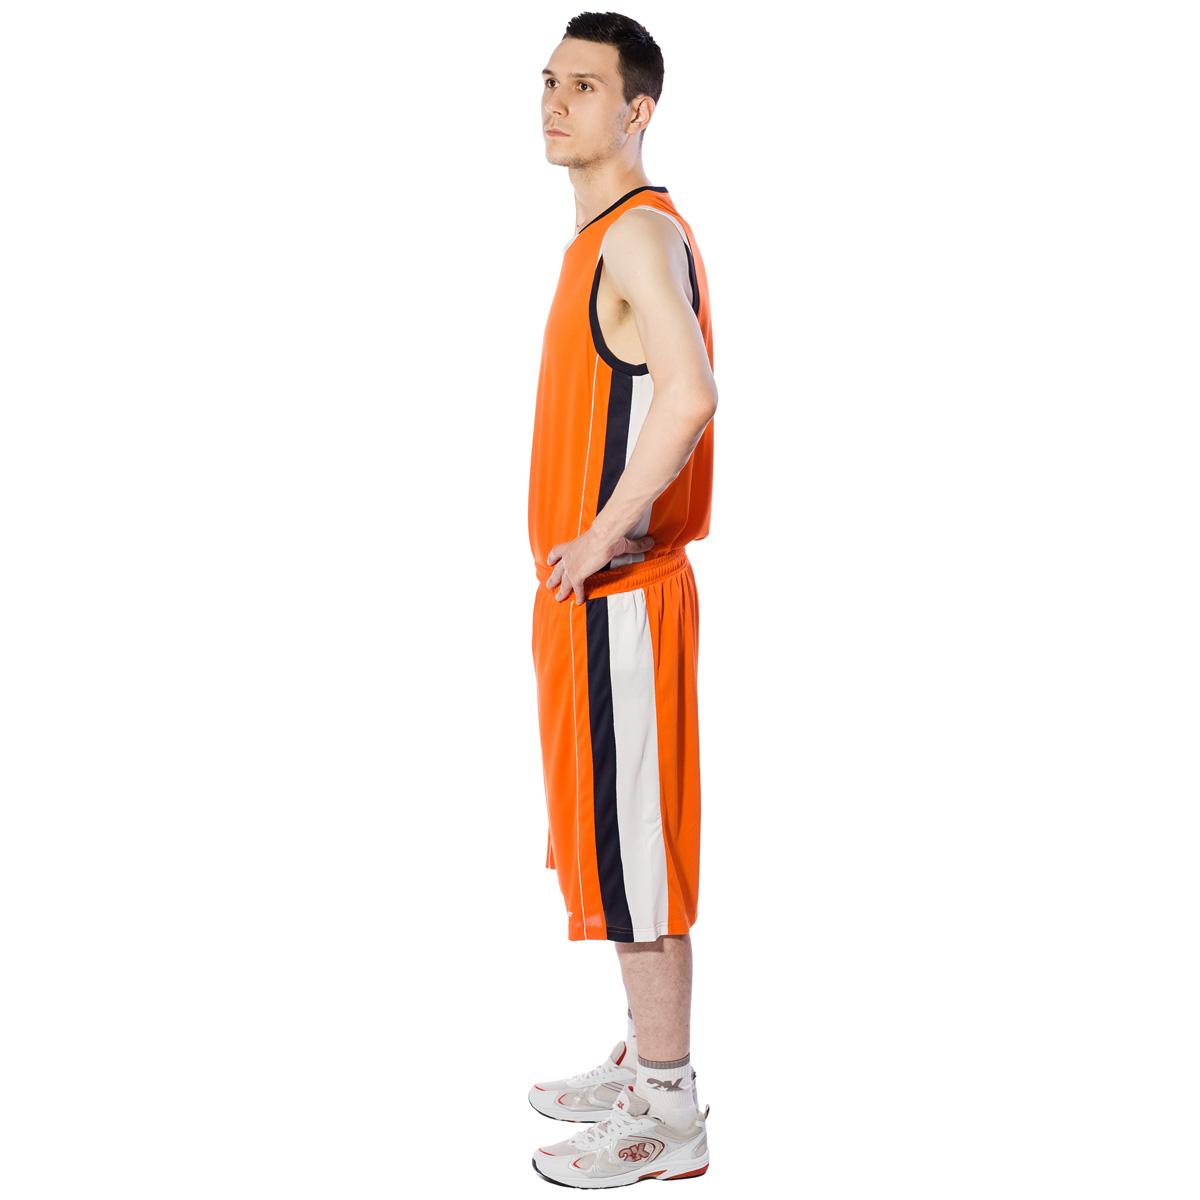 Майка баскетбольная мужская 2K Sport Advance, цвет:  оранжевый, темно-синий, белый.  130030.  Размер XS (44) 2K Sport